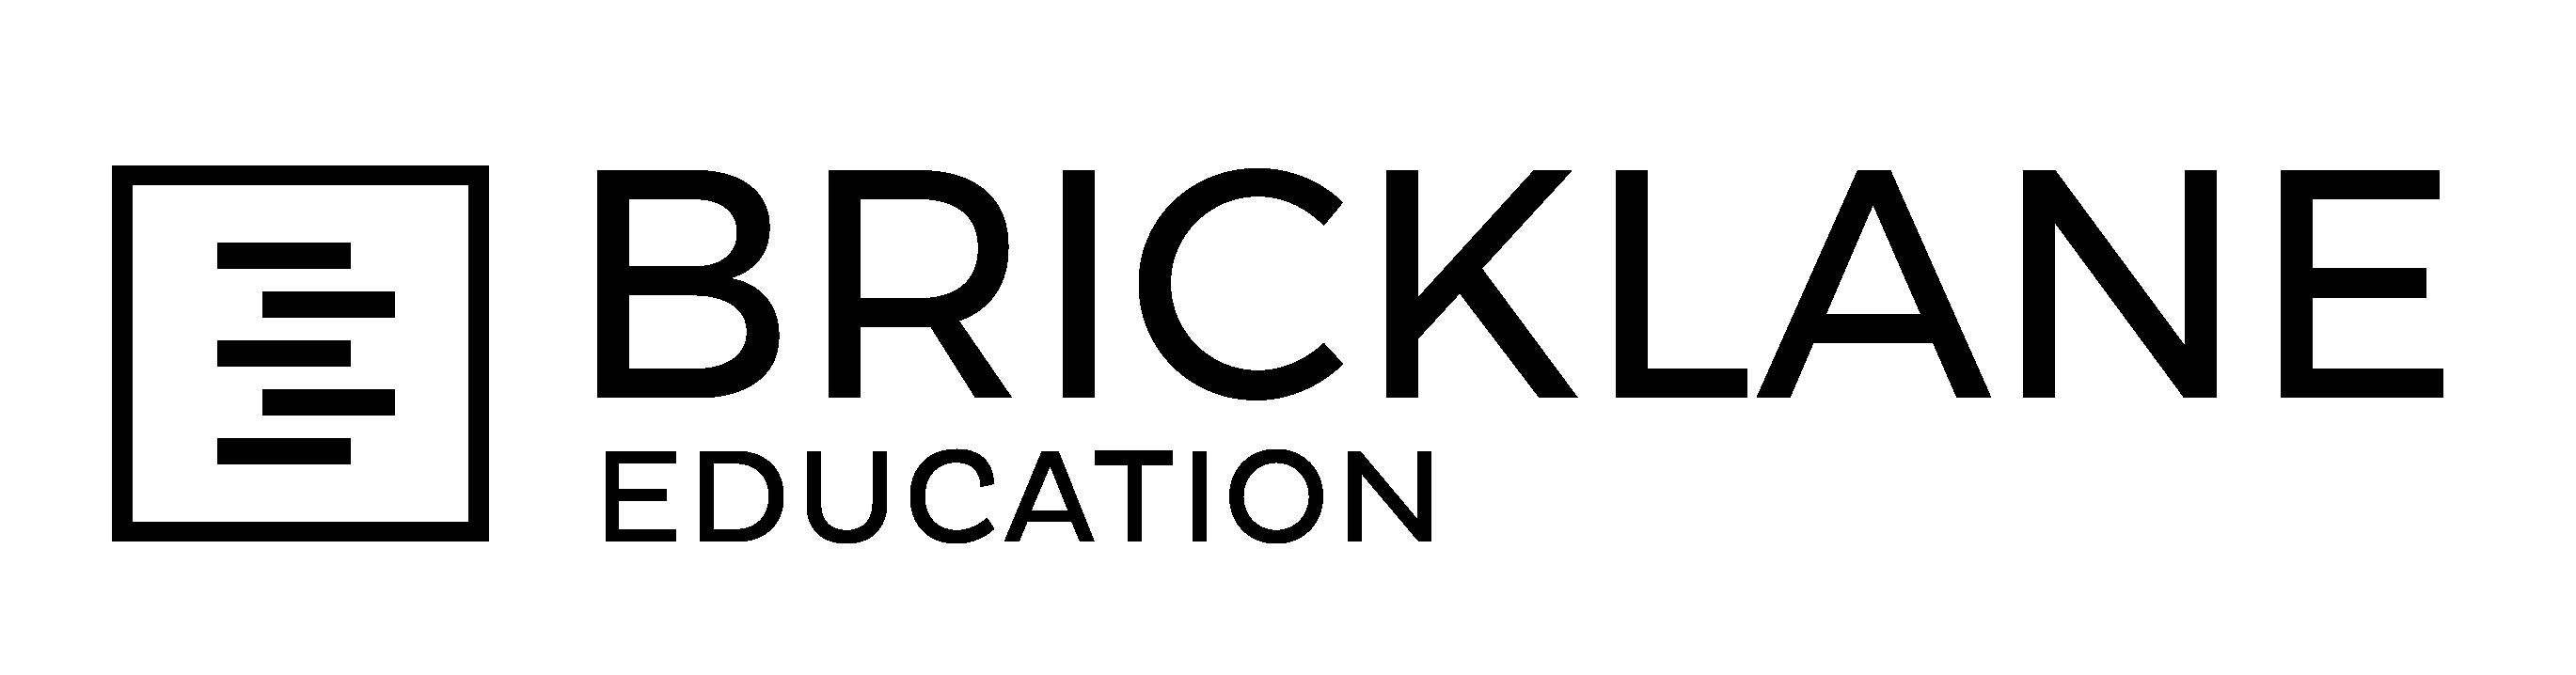 Bricklane Education Logo